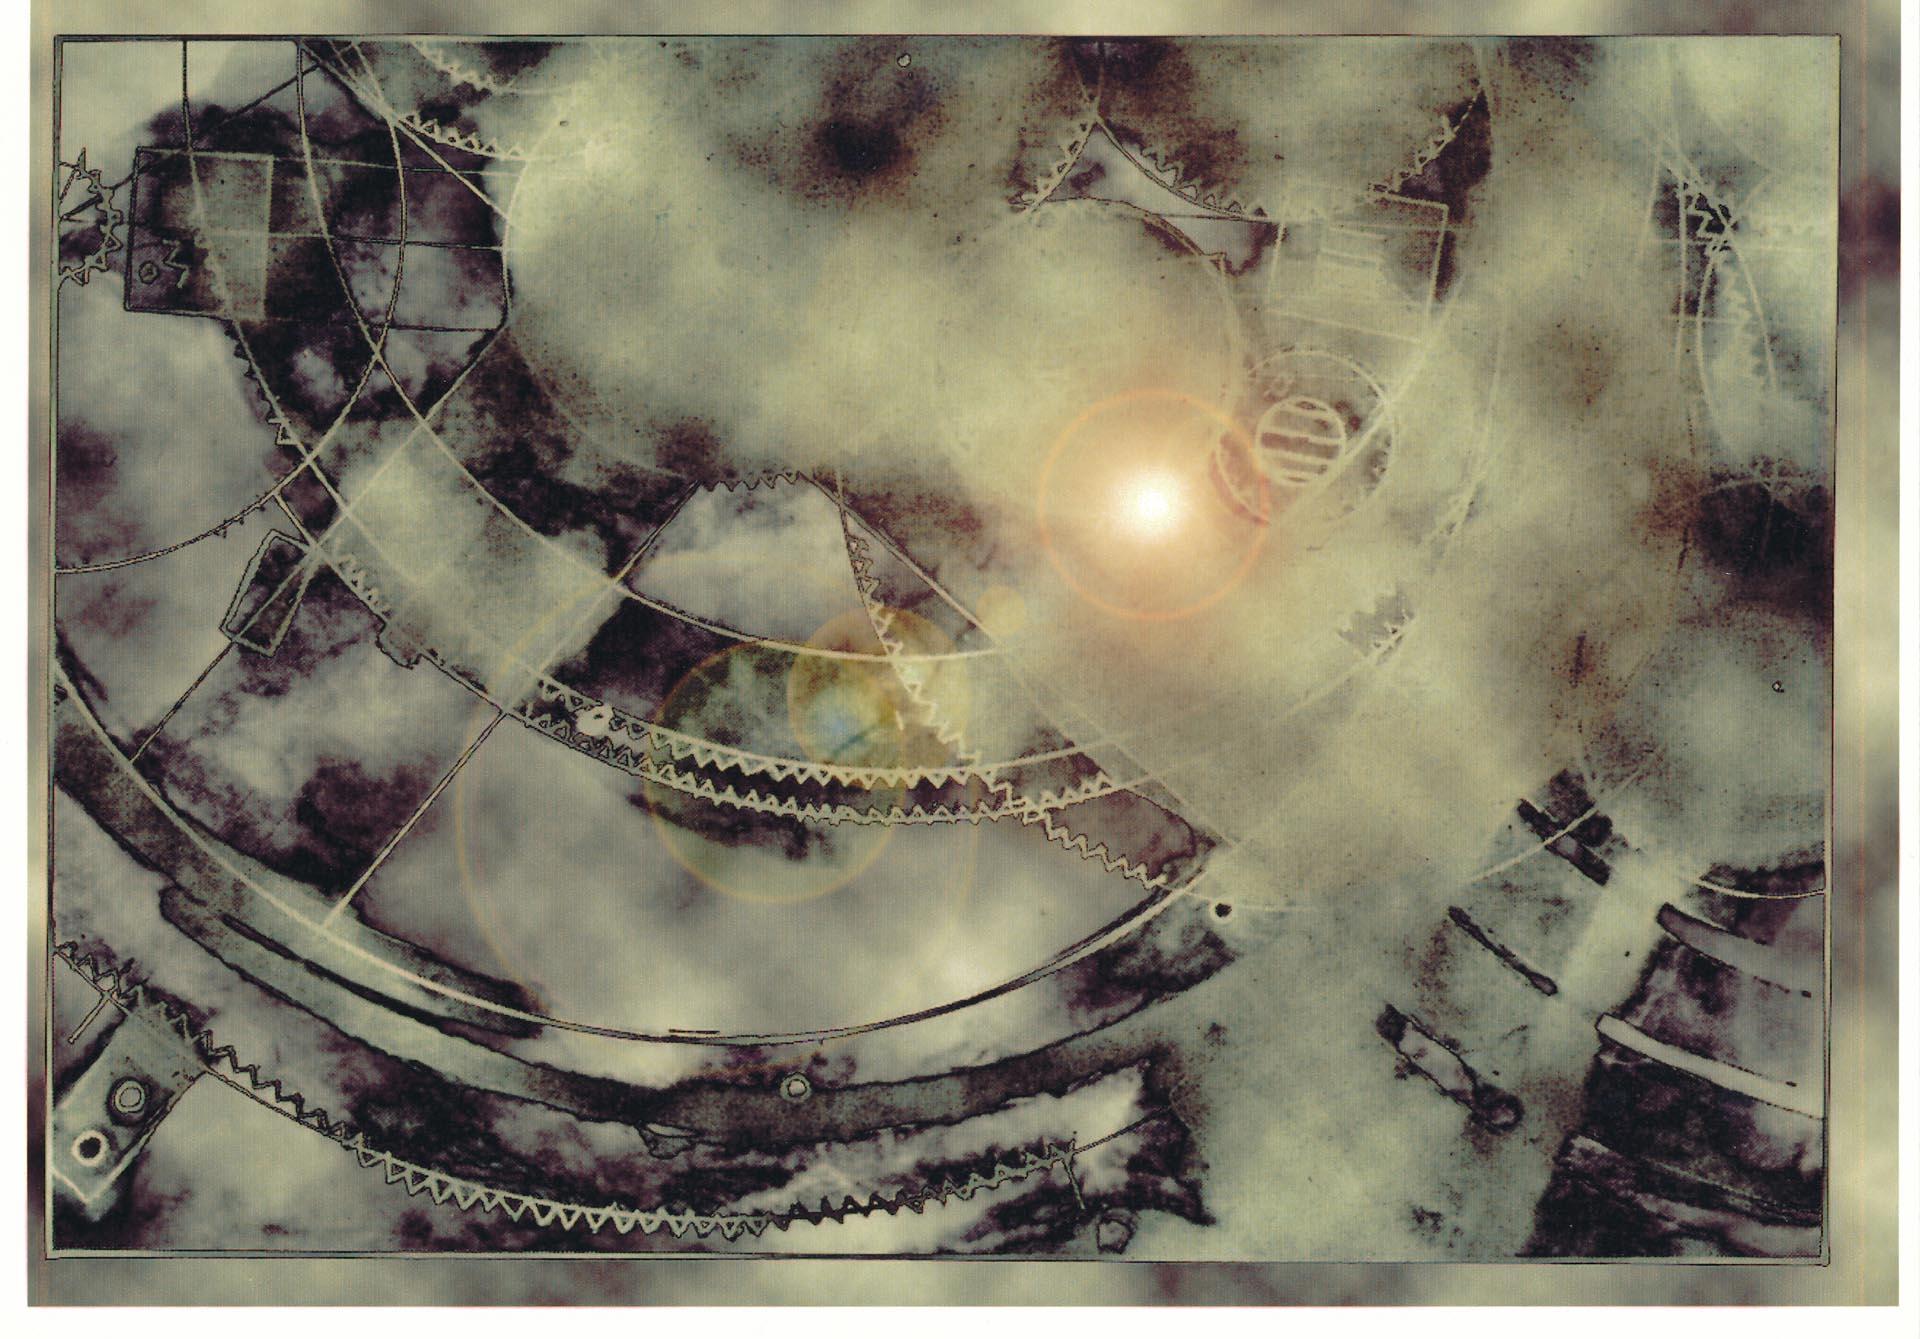 L'Enigma di Antikithera-Fotogramma da pellicola Lith & Luminogram, 2012